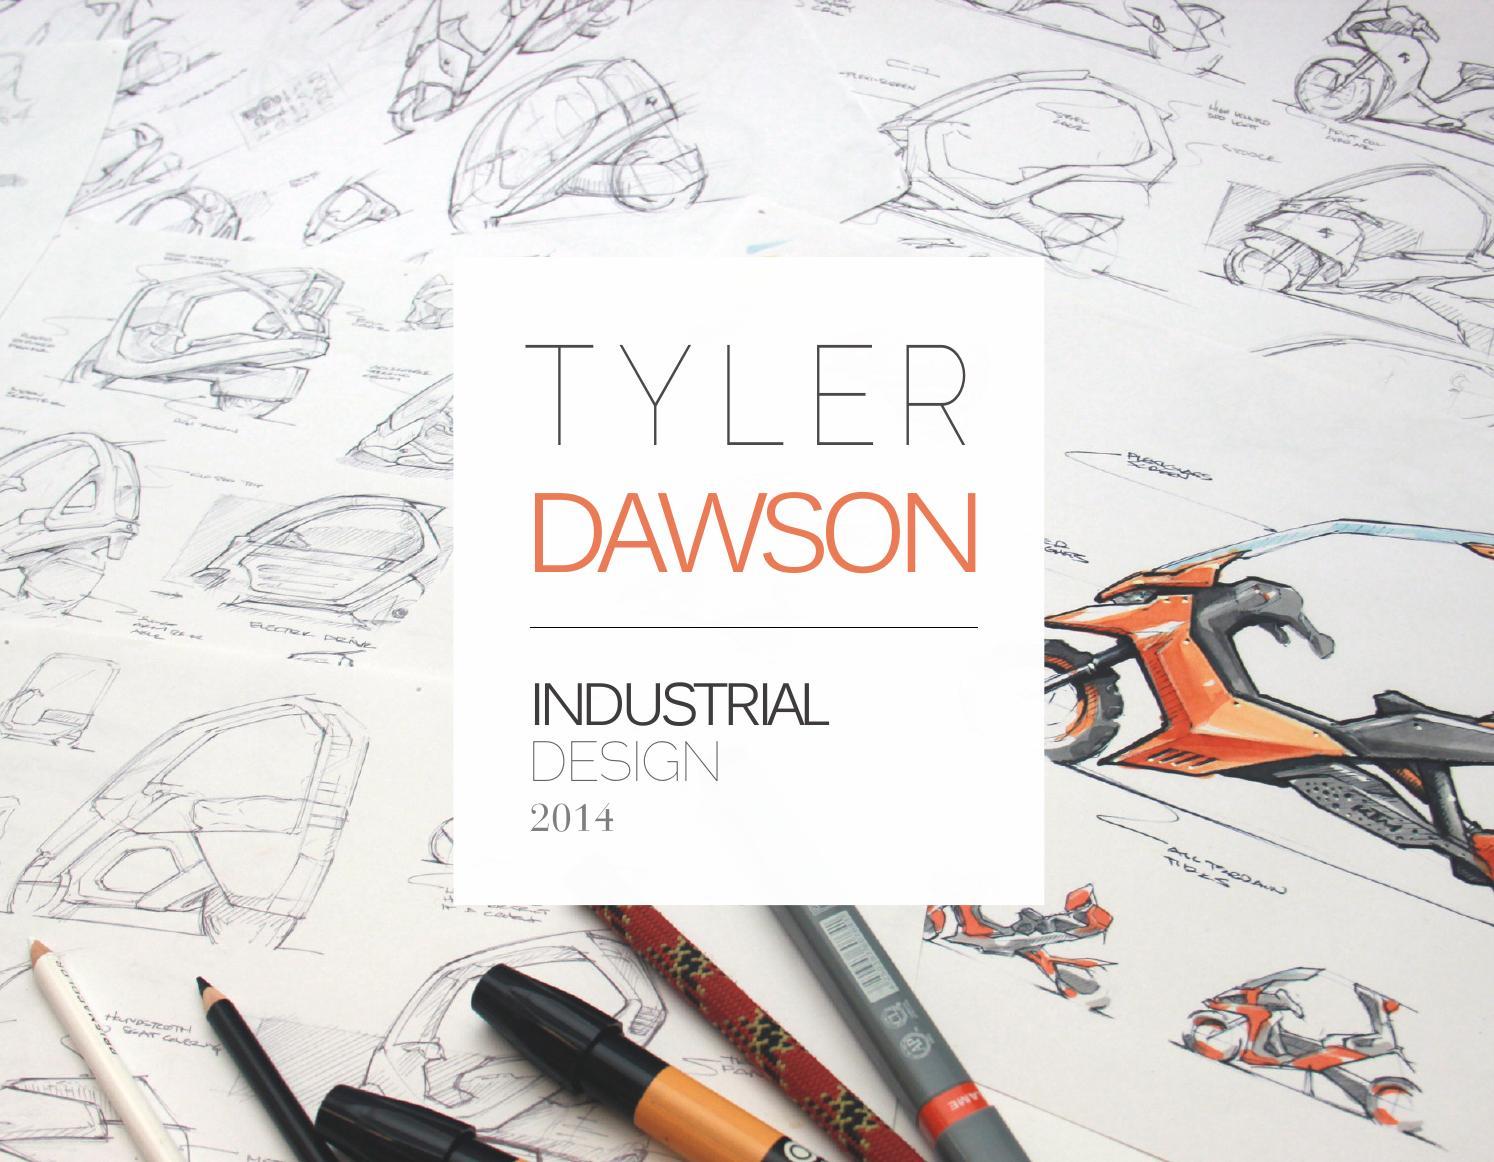 Tyler dawson industrial design portfolio 2014 by tyler for Product designer